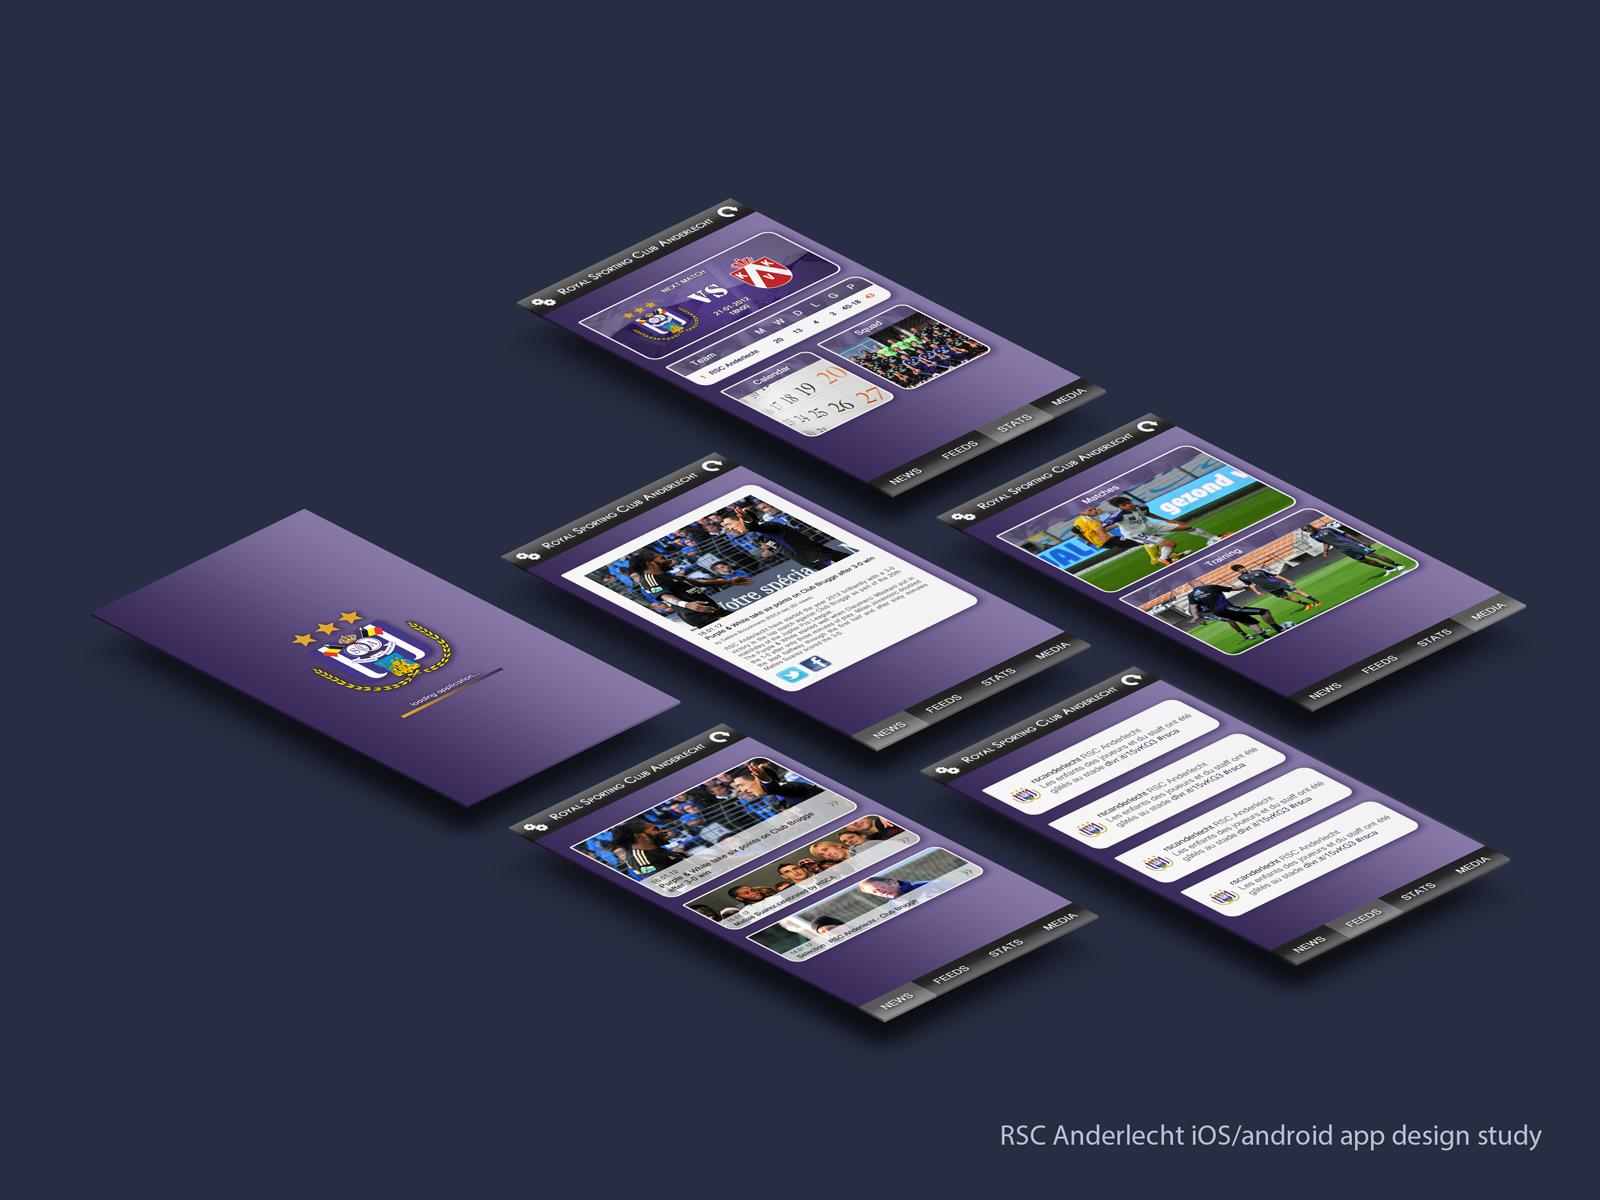 rsc anderlecht iosandroid app design study by luisfccorreia